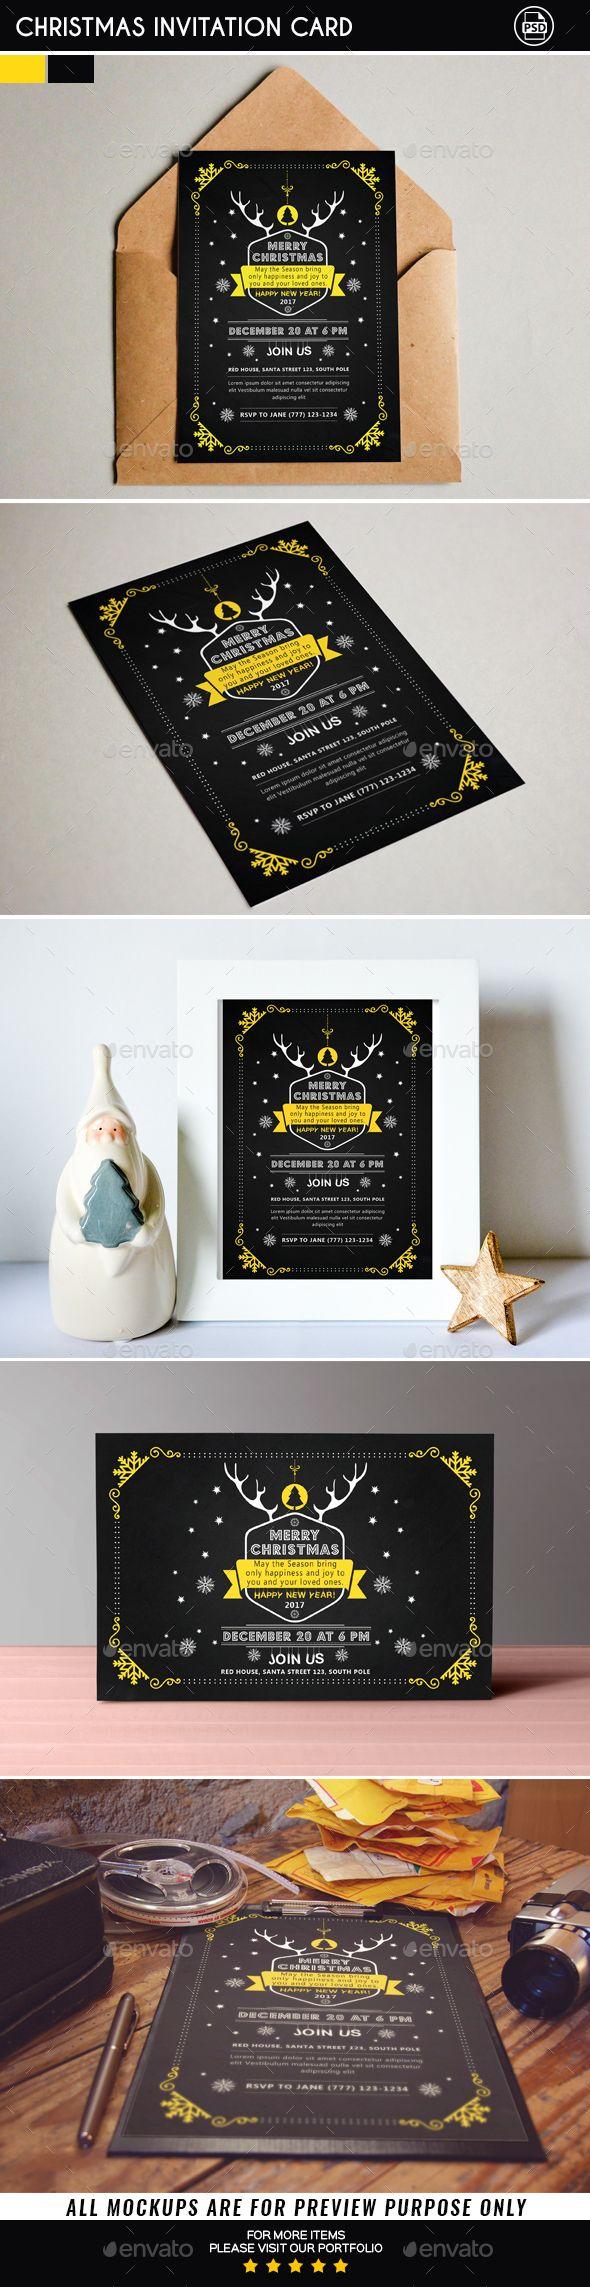 Christmas Invitation Card Christmas Invitation Card Christmas Invitations Christmas Card Template